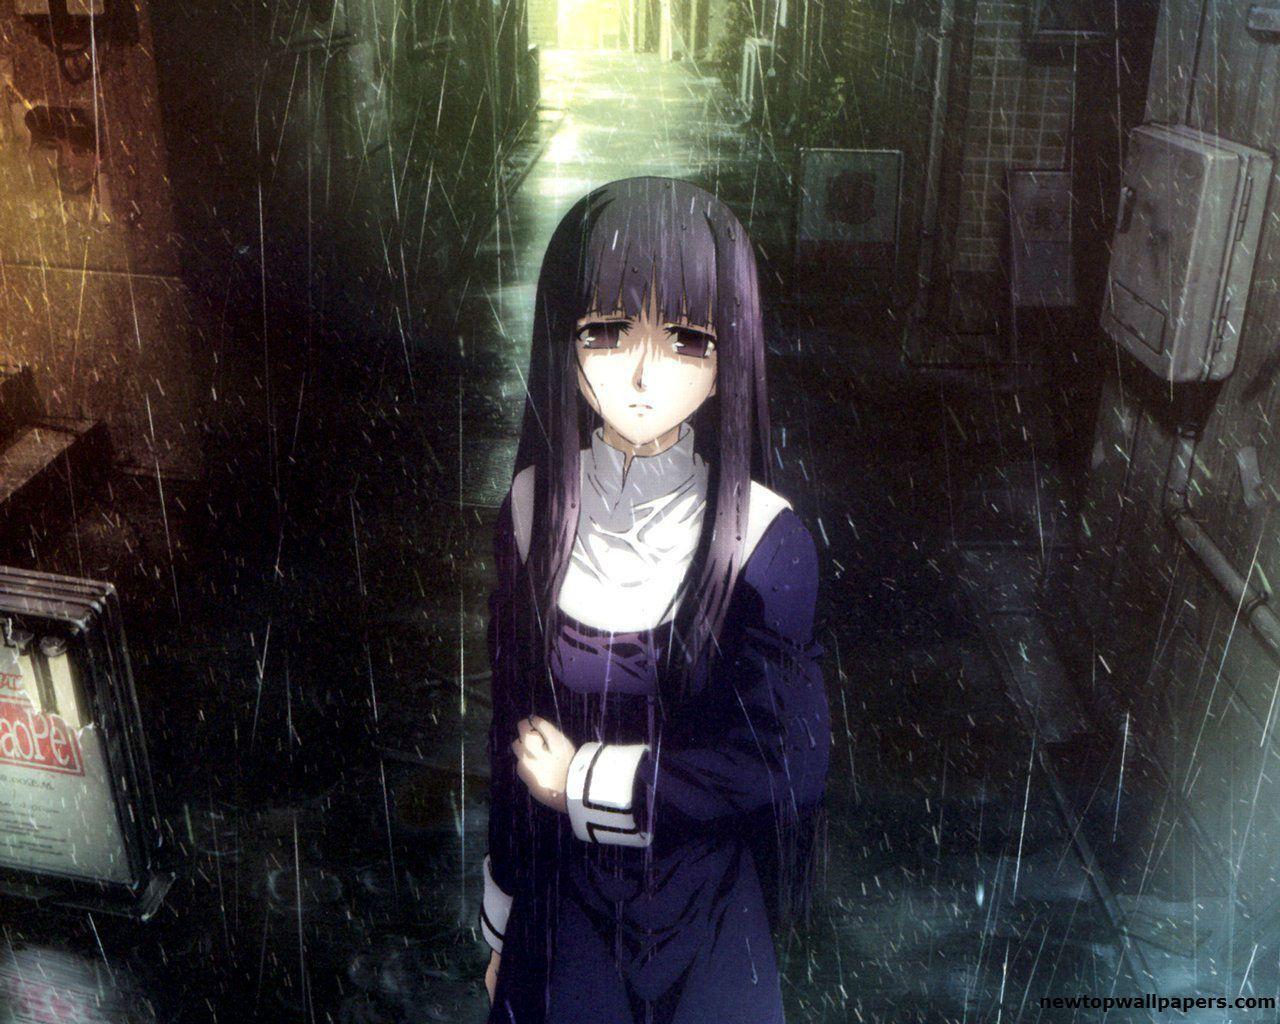 Sad Rain Anime Wallpapers - Top Free ...